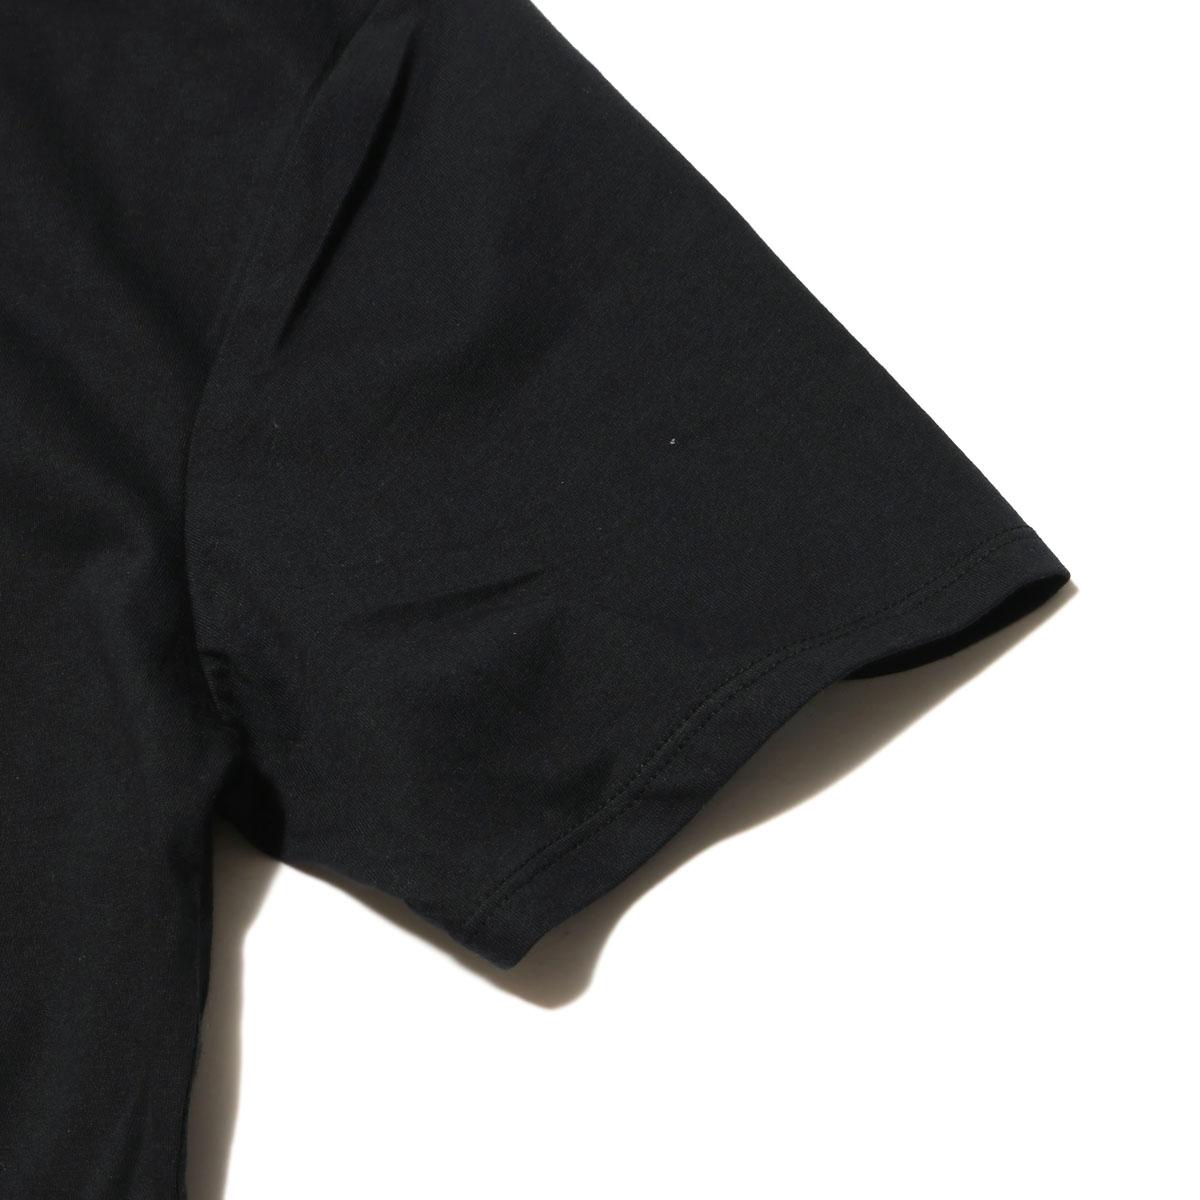 NIKE OSAKA SWOOSH PRINT TEE (ナイキオオサカスウッシュプリント T-shirt) (BLACK) 17SU-I